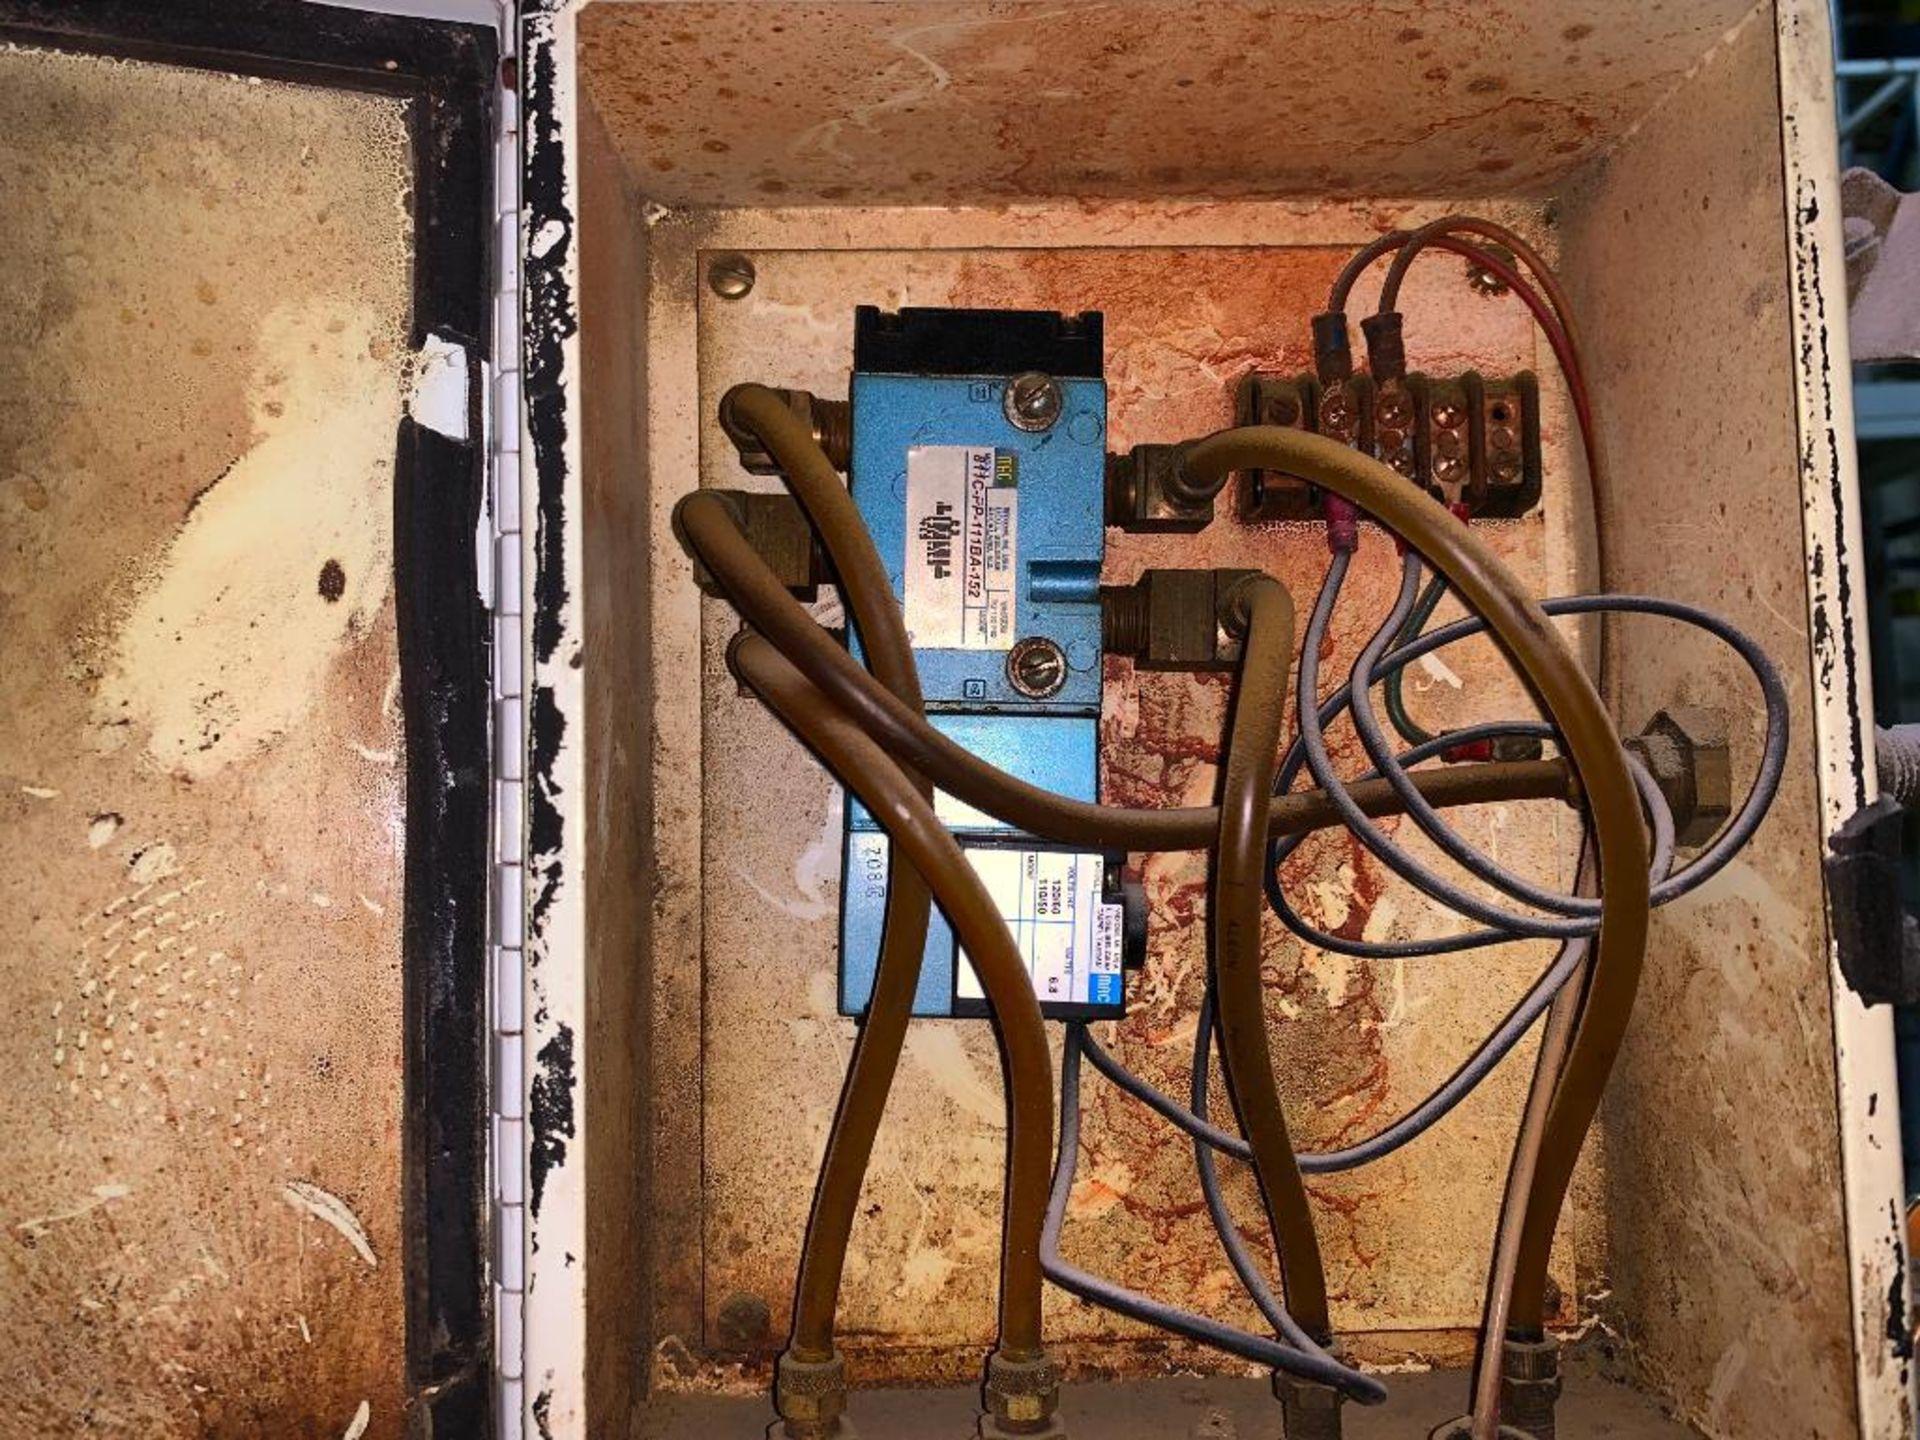 Aseeco mild steel cone bottom bulk storage bin - Image 13 of 16